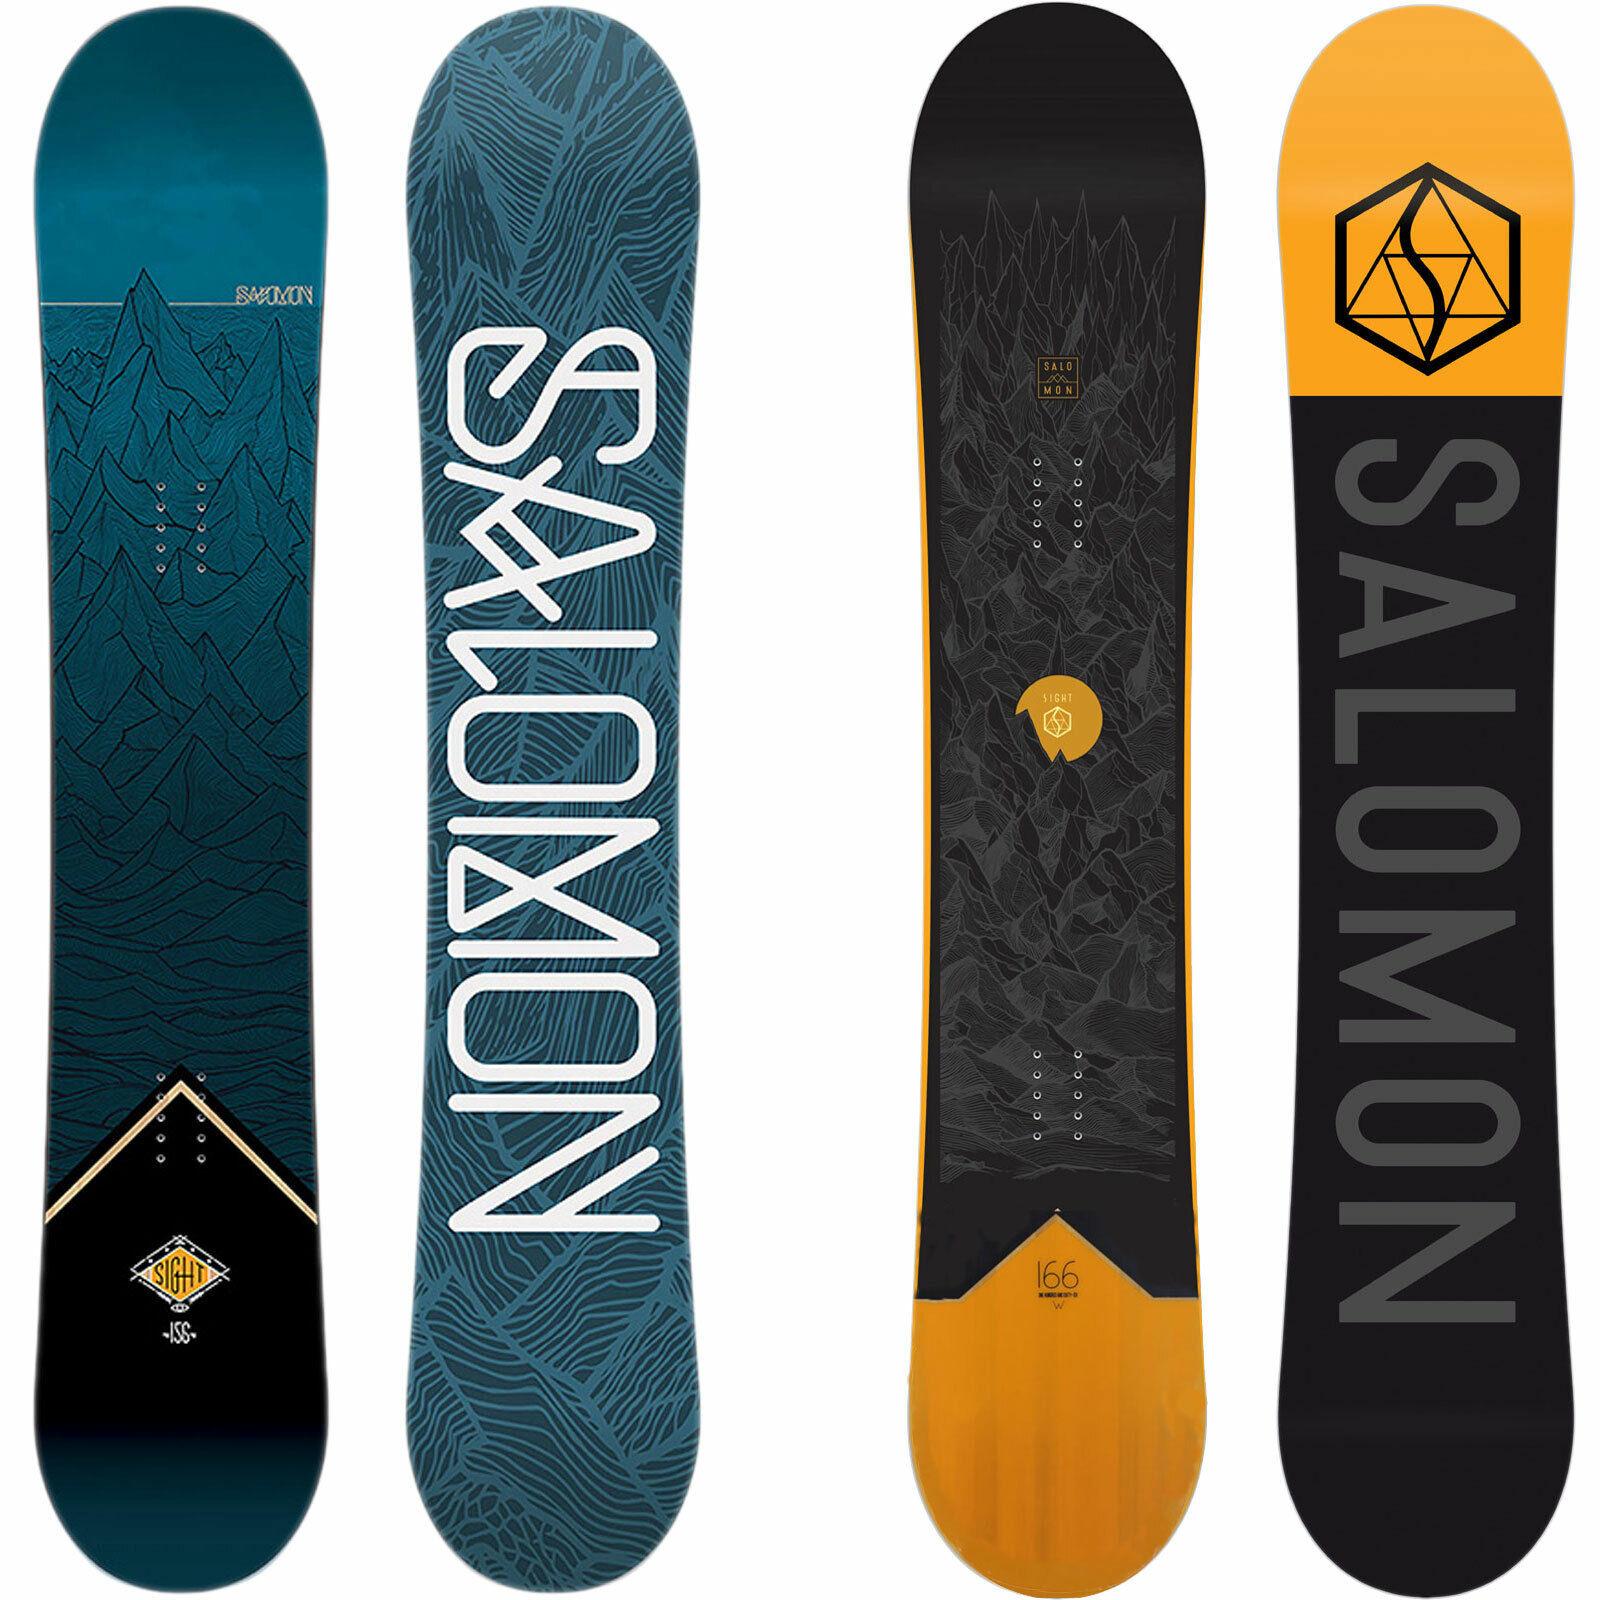 snowboard visszér visszér gyanúja mit kell tenni